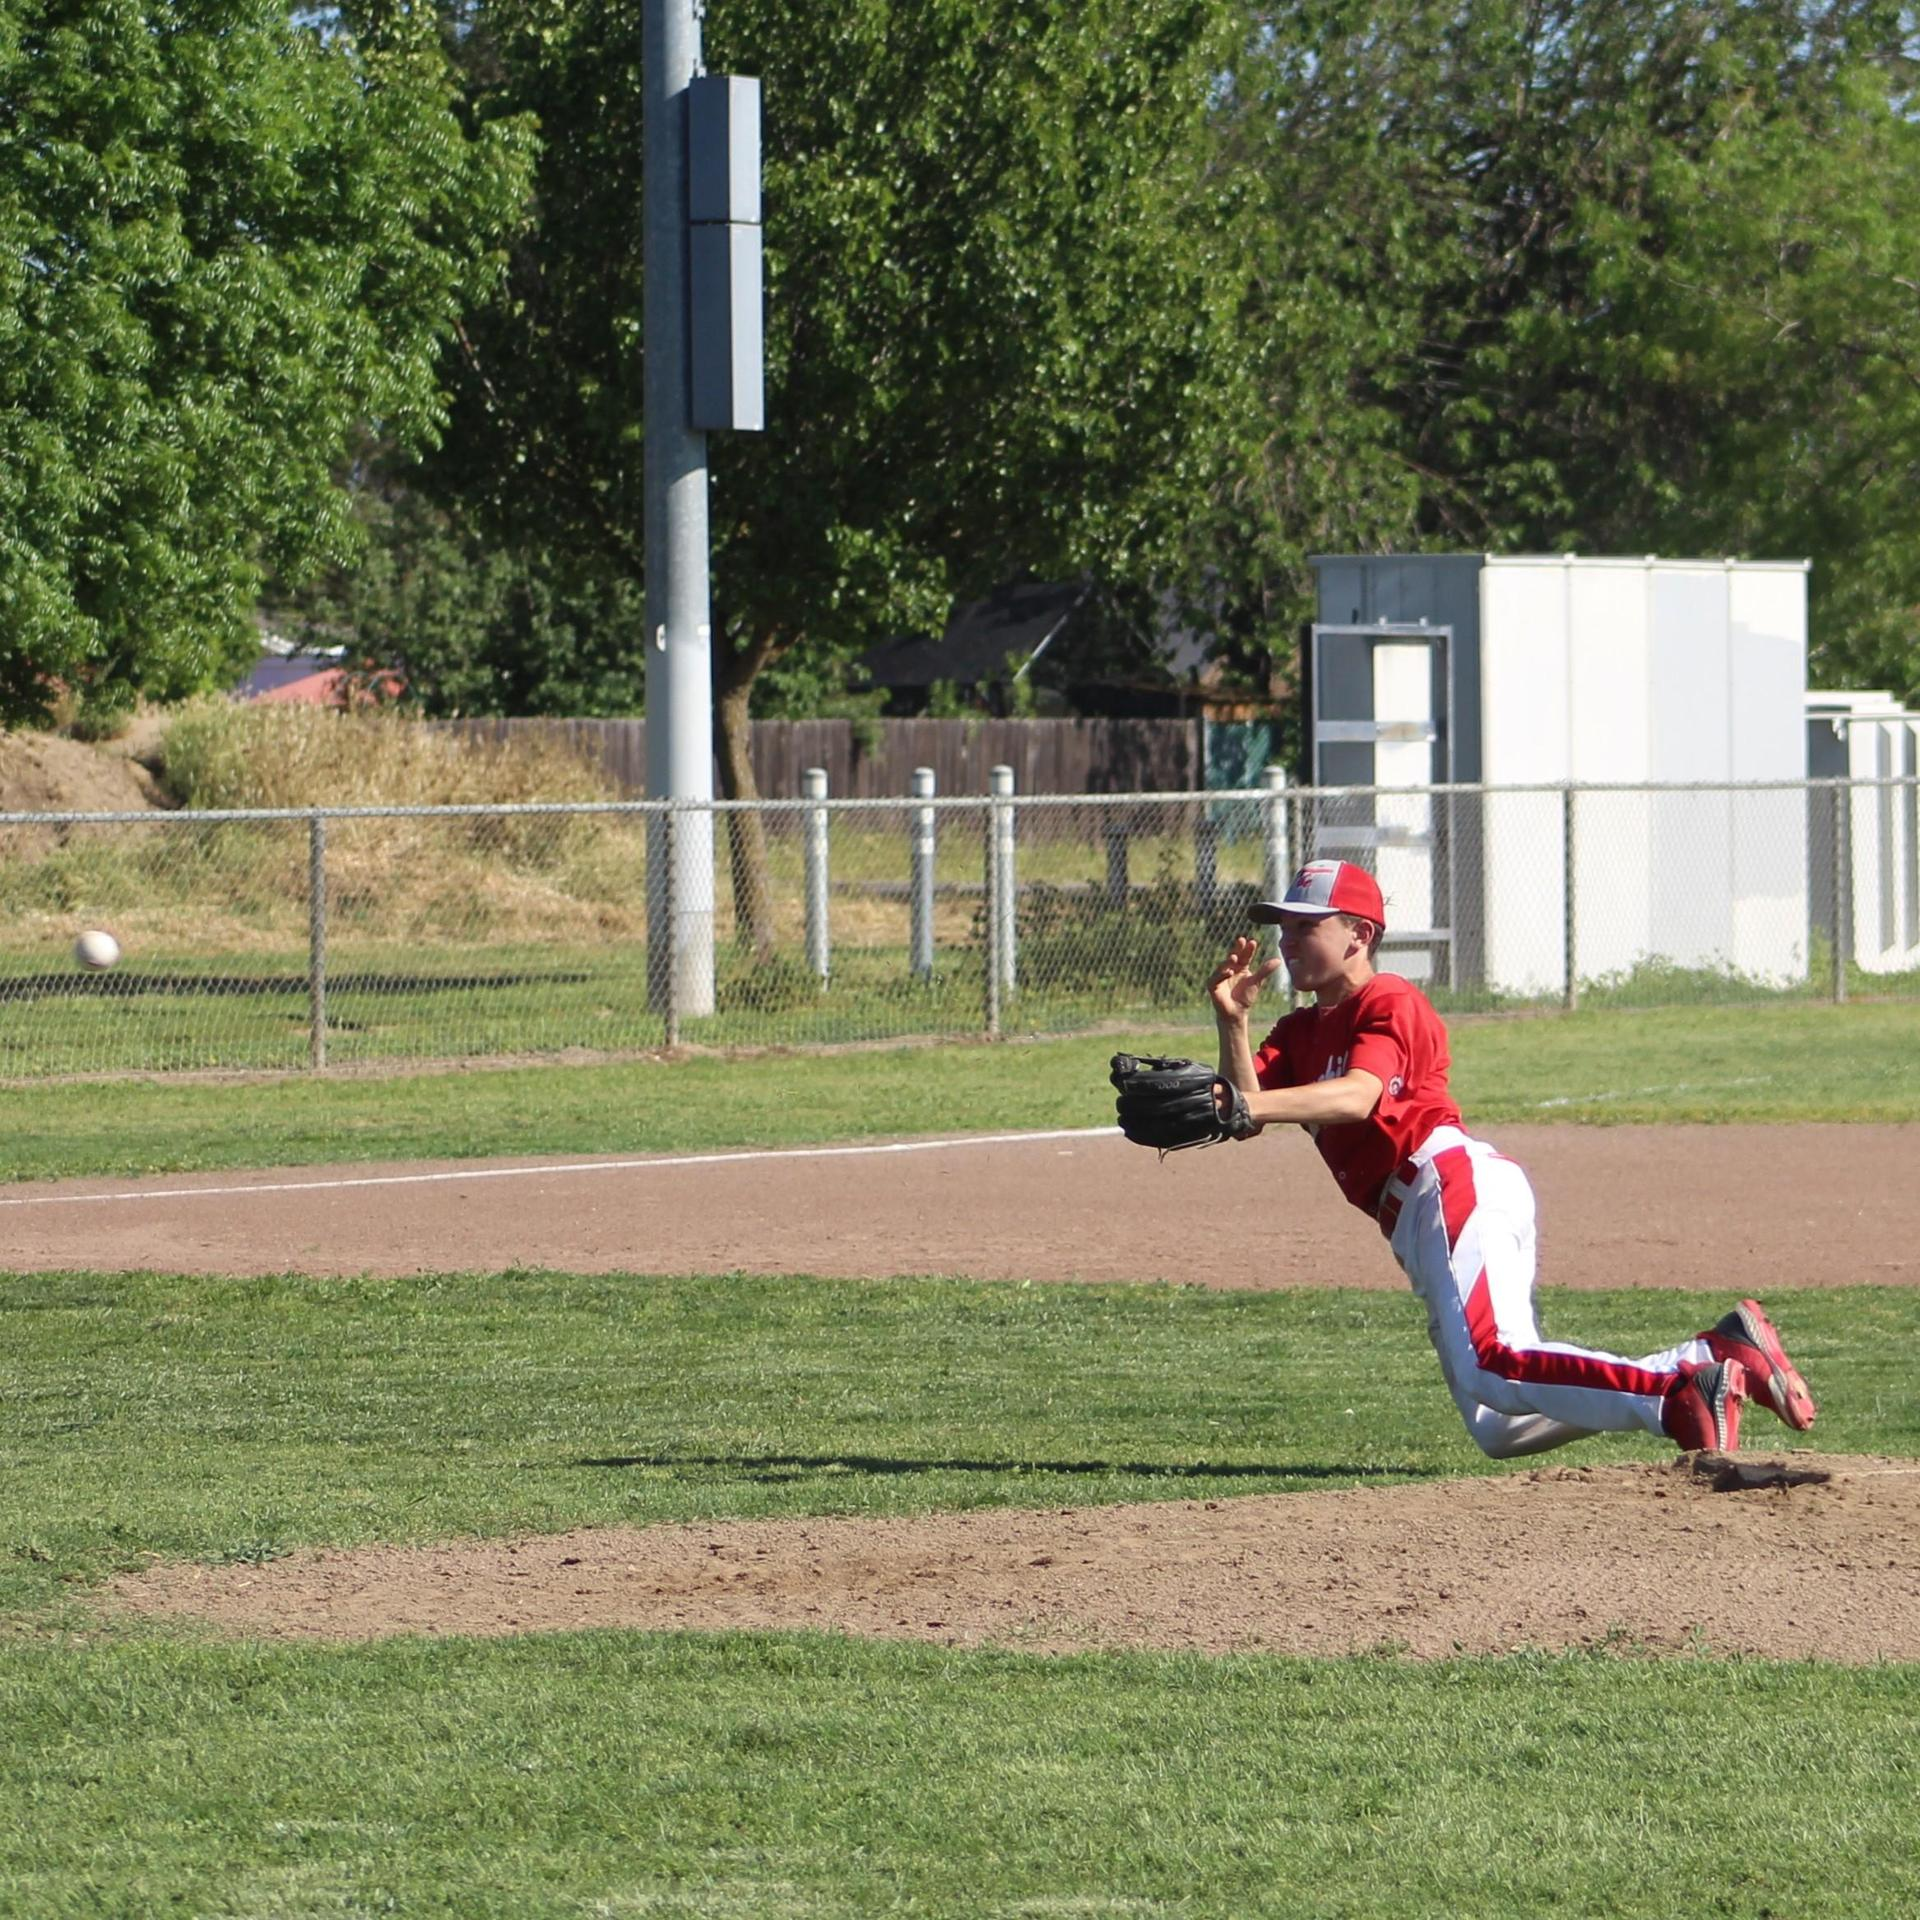 JV baseball players in action against Washington Union